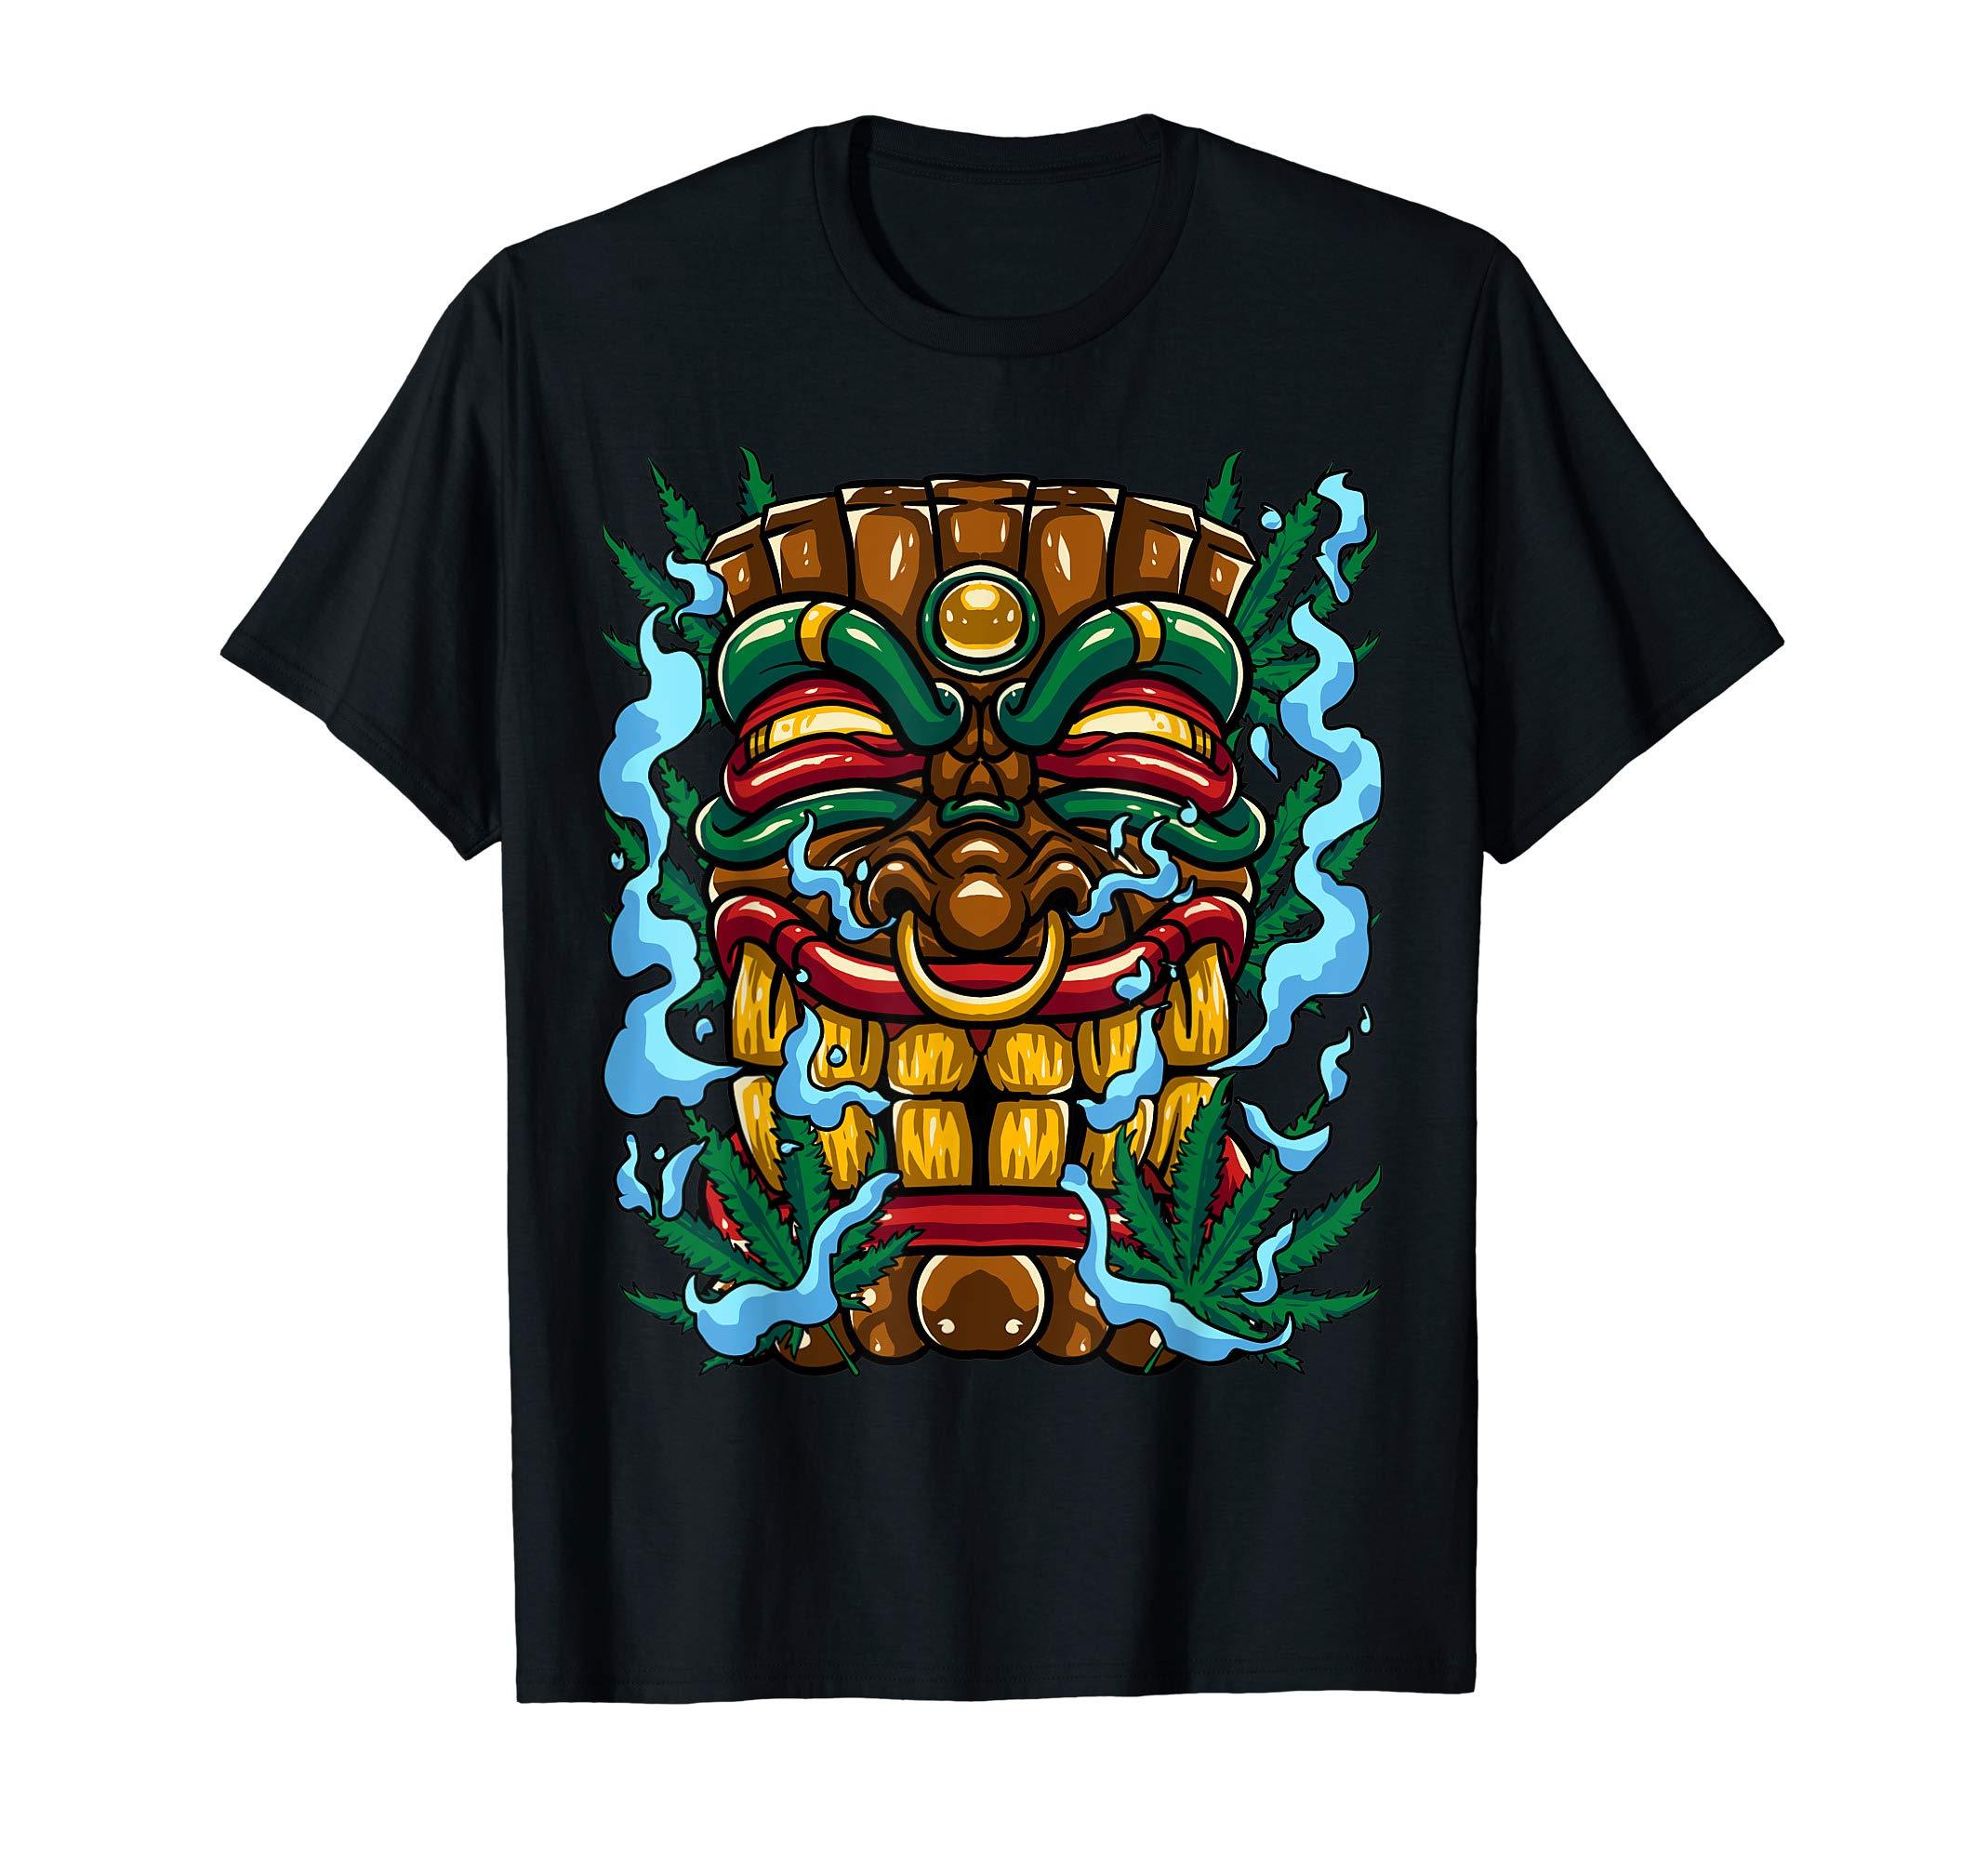 Hemp Cannabis Tiki Mask Smoke Marihuana Weed T-Shirt Gift